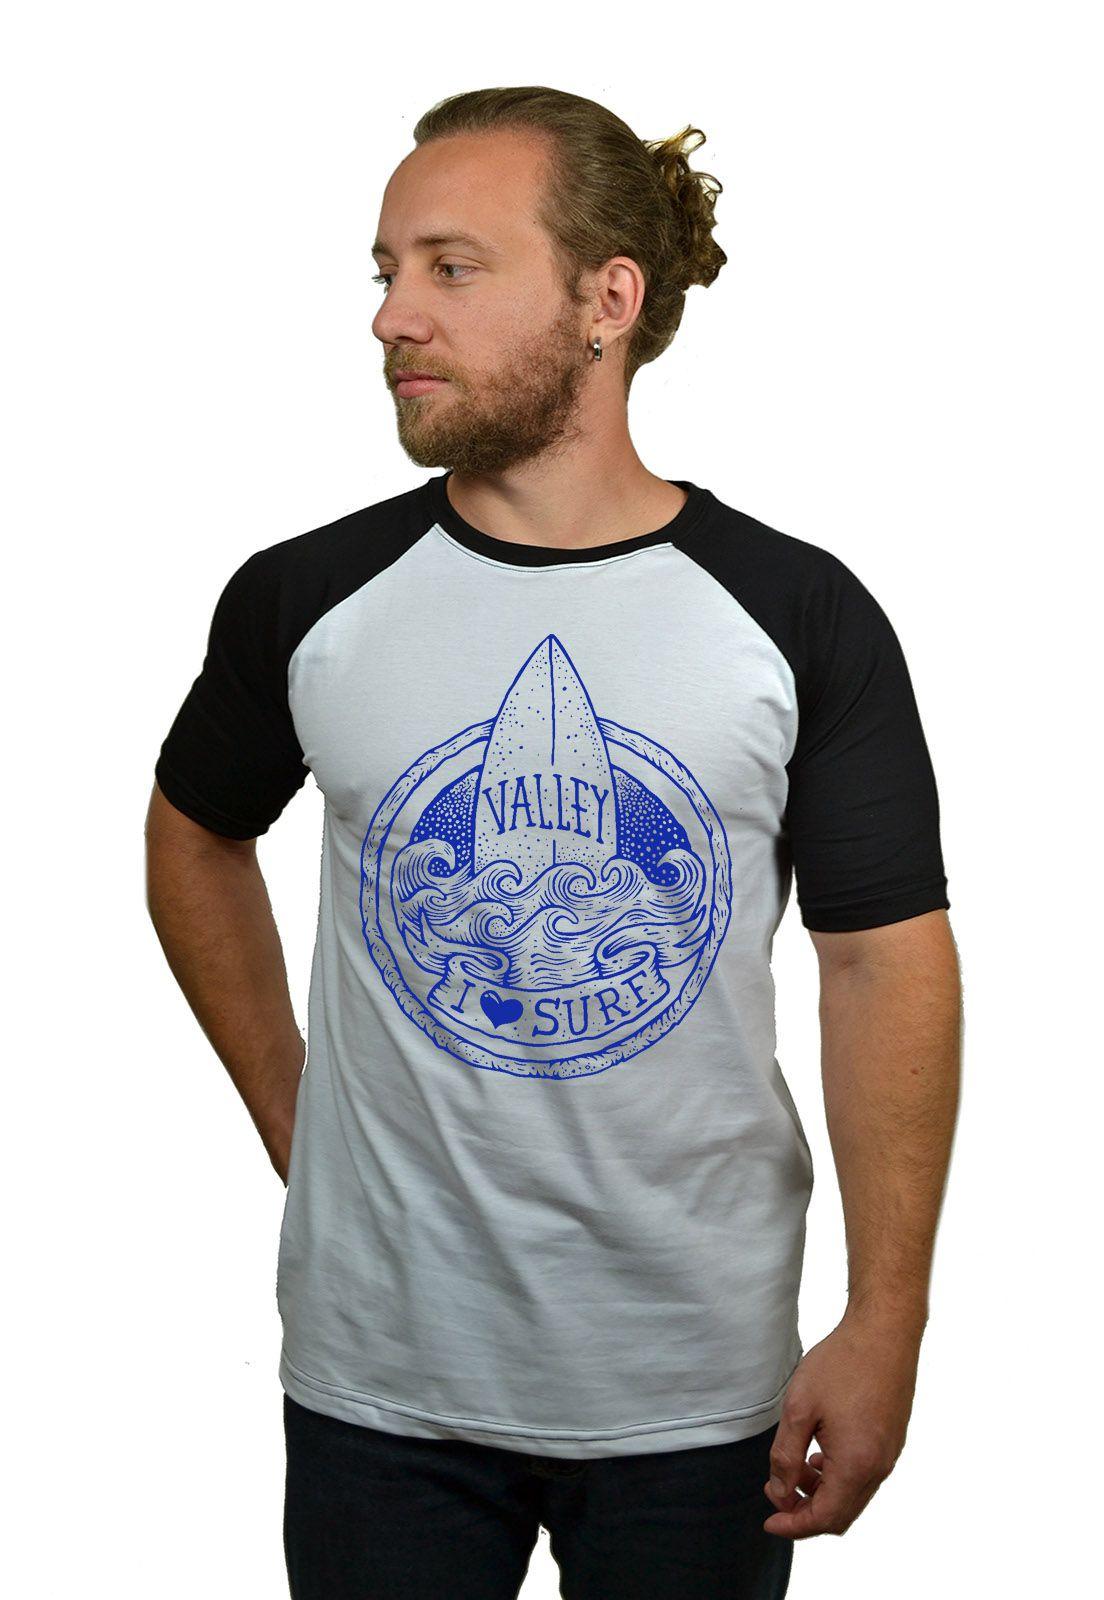 Camiseta Raglan Hshop Love Surf - Branco com Preto  - HShop